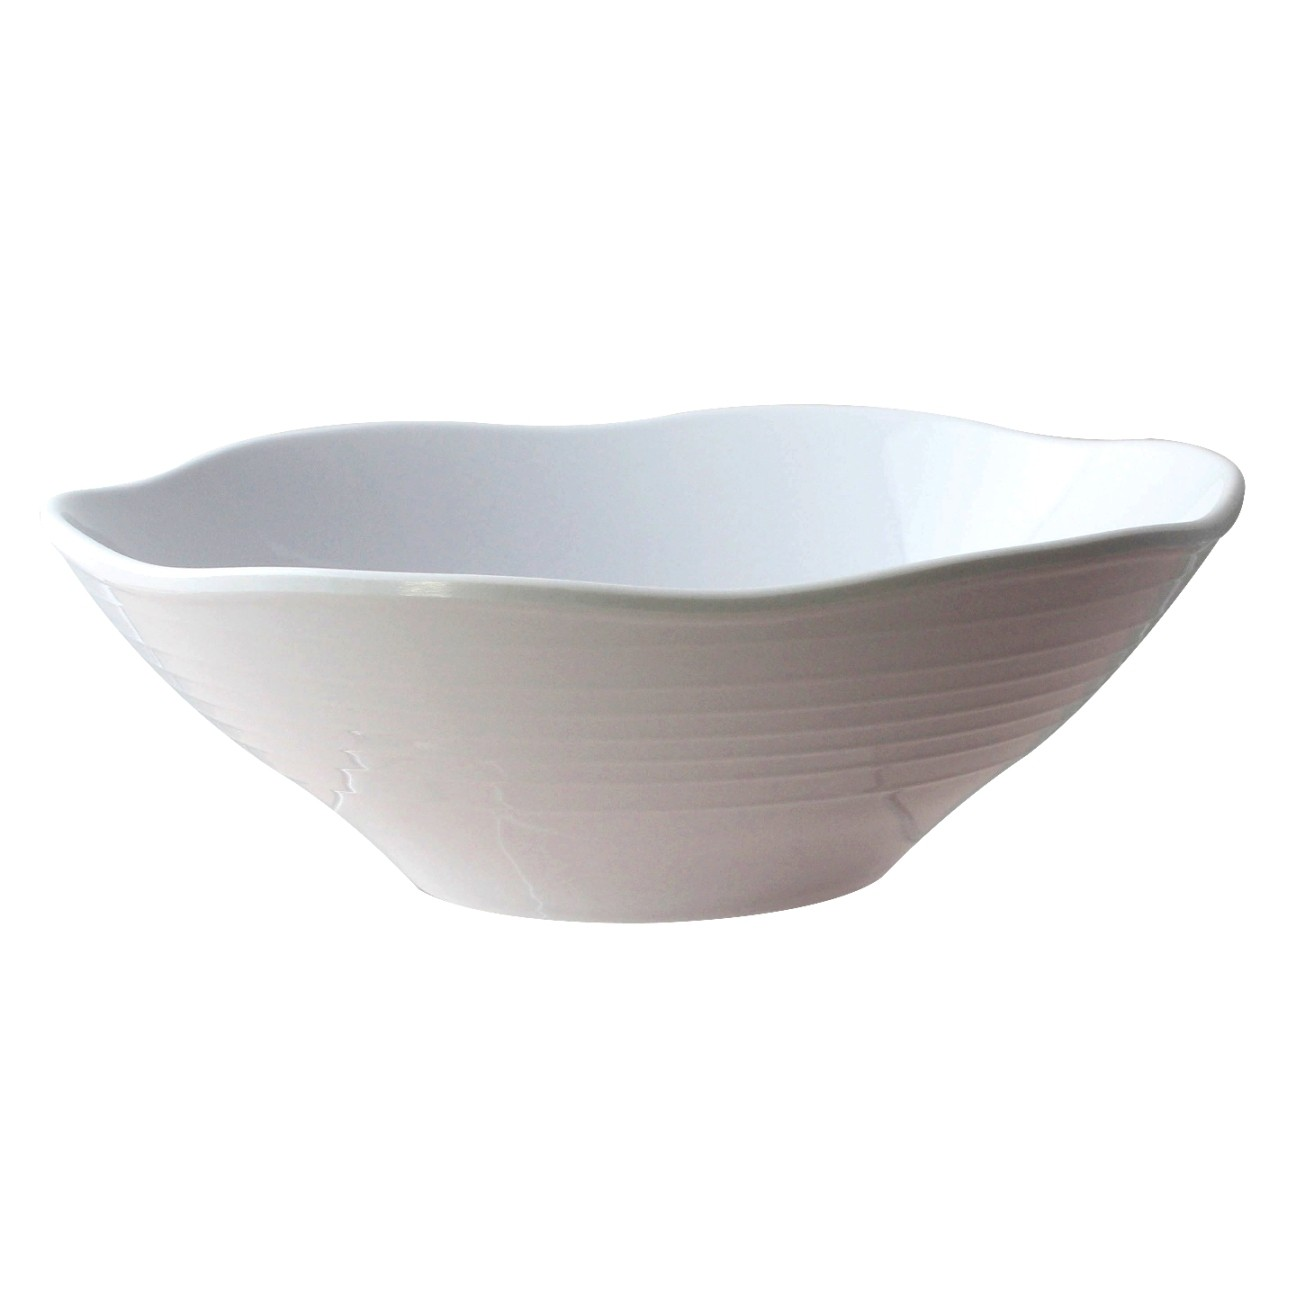 Classic White Melamine Soup Bowl, 45 Oz, 9